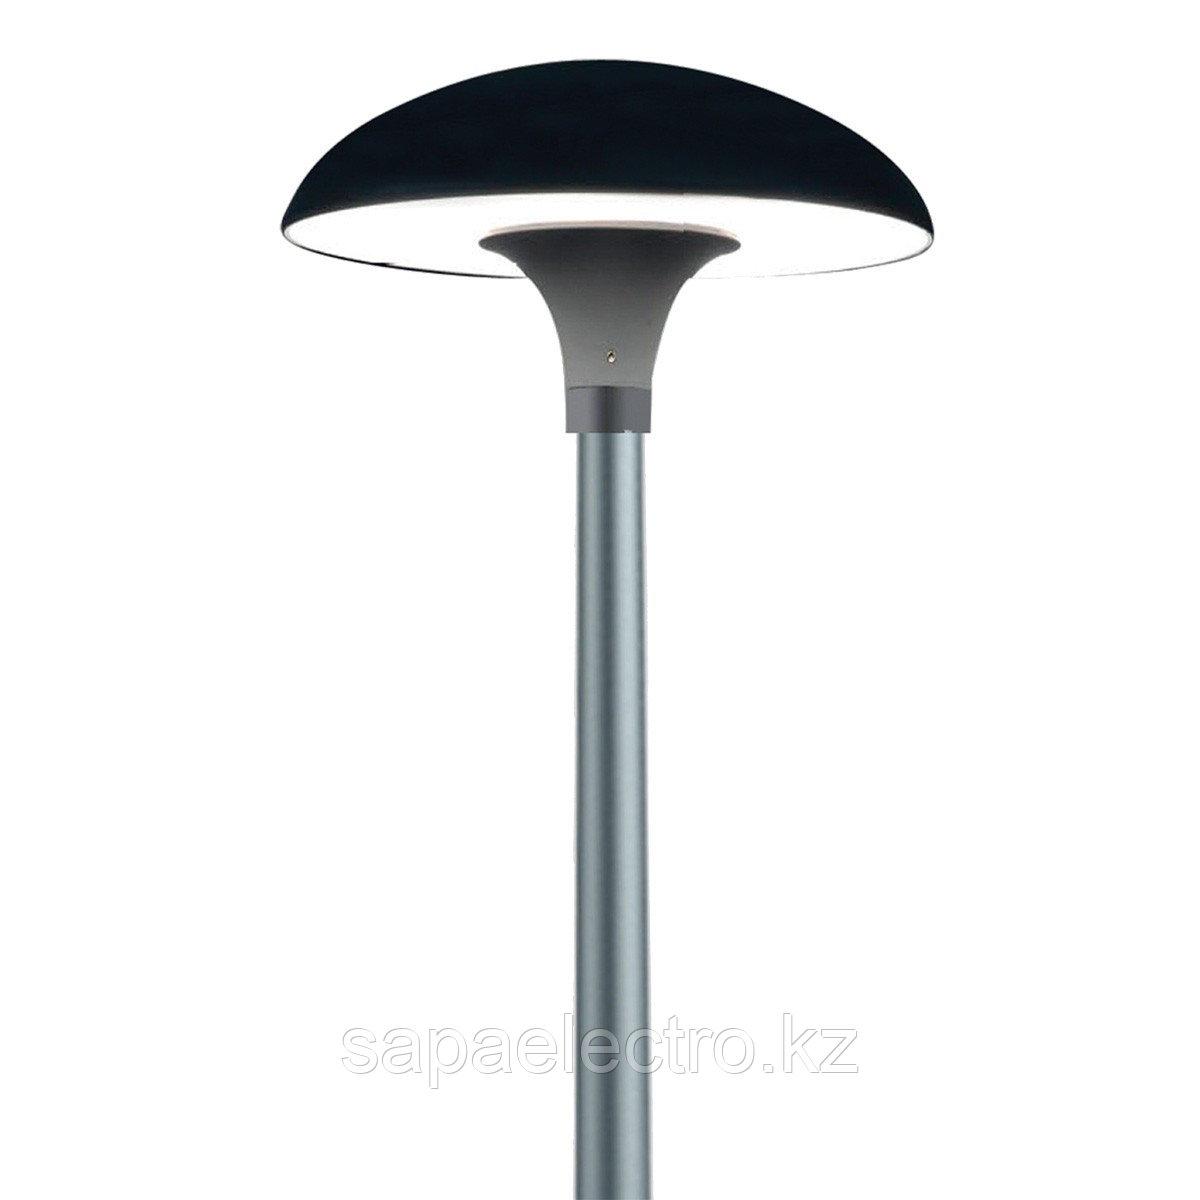 Свет-к LED YM6132A 100W 5700K IP65(без трубы)(TS)1ш